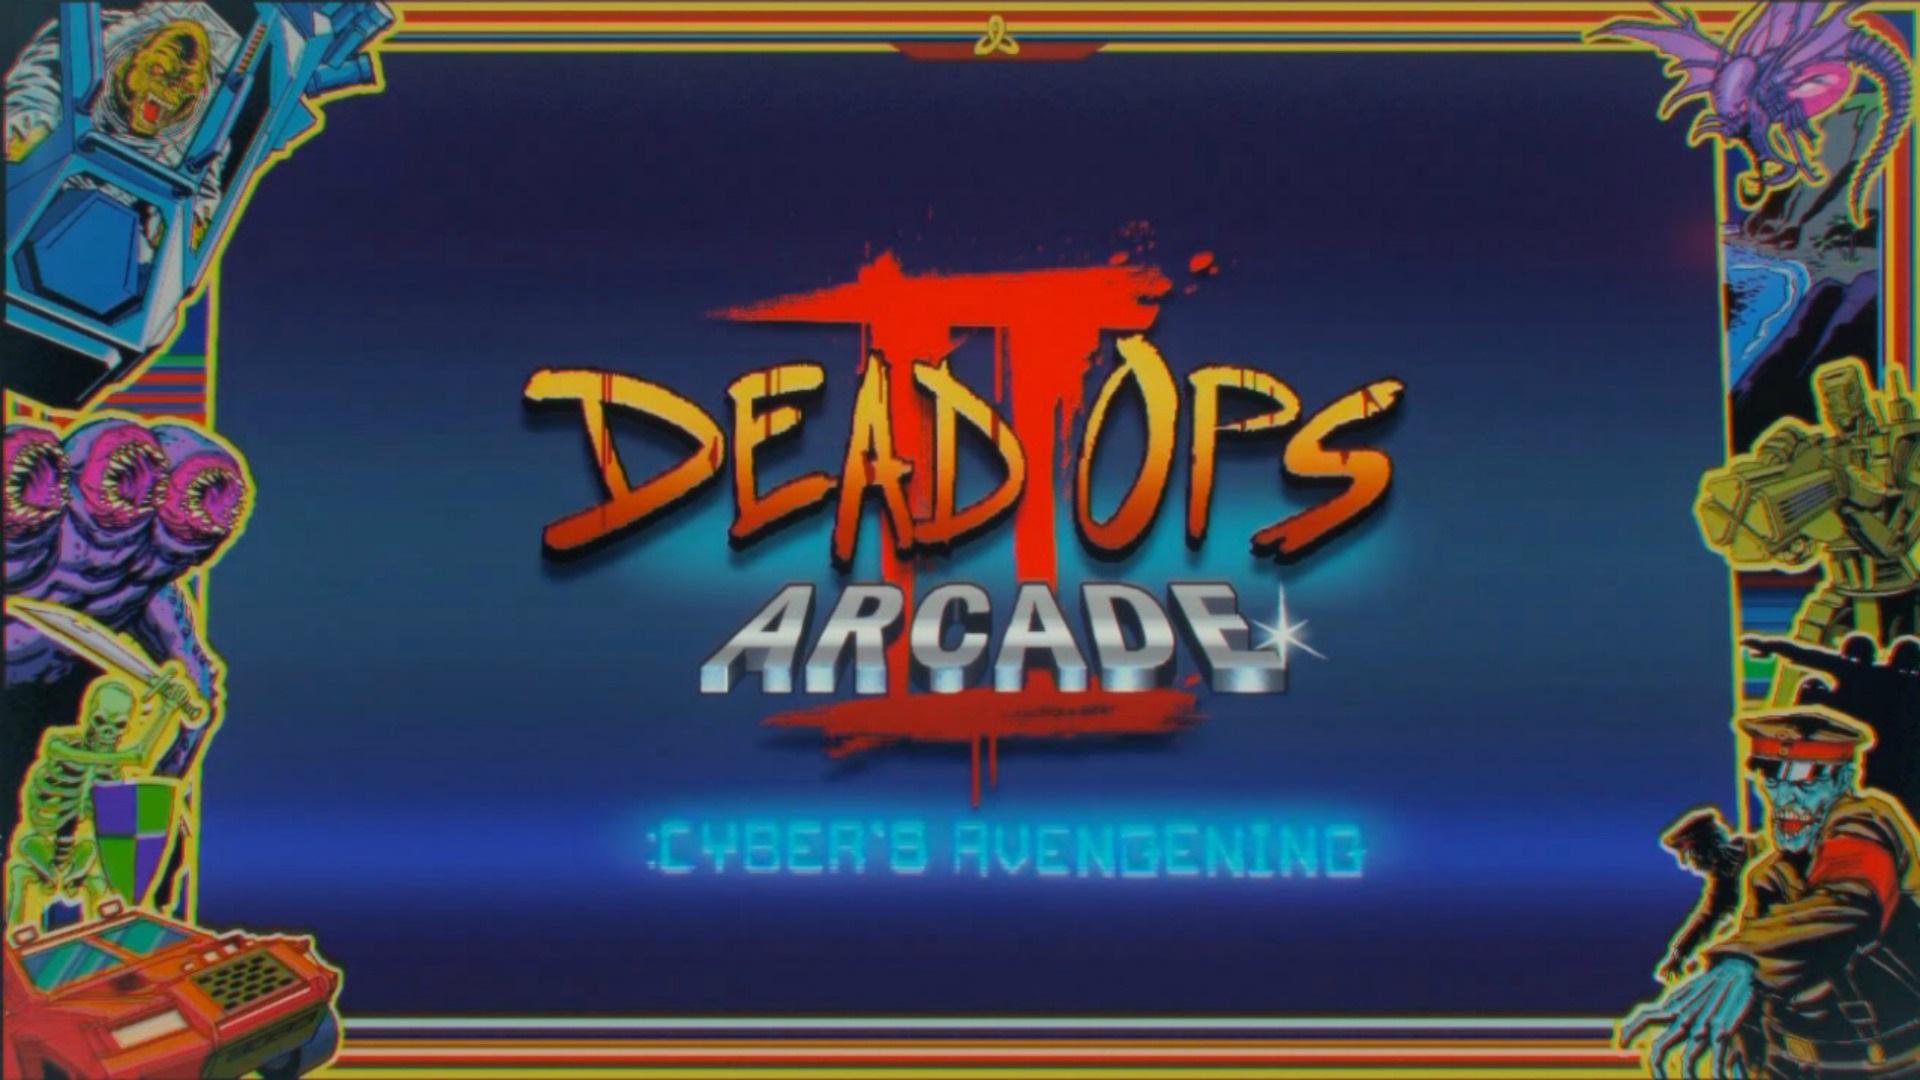 Dead Ops Arcade 2: Cyber's Avengening | Call of Duty Wiki